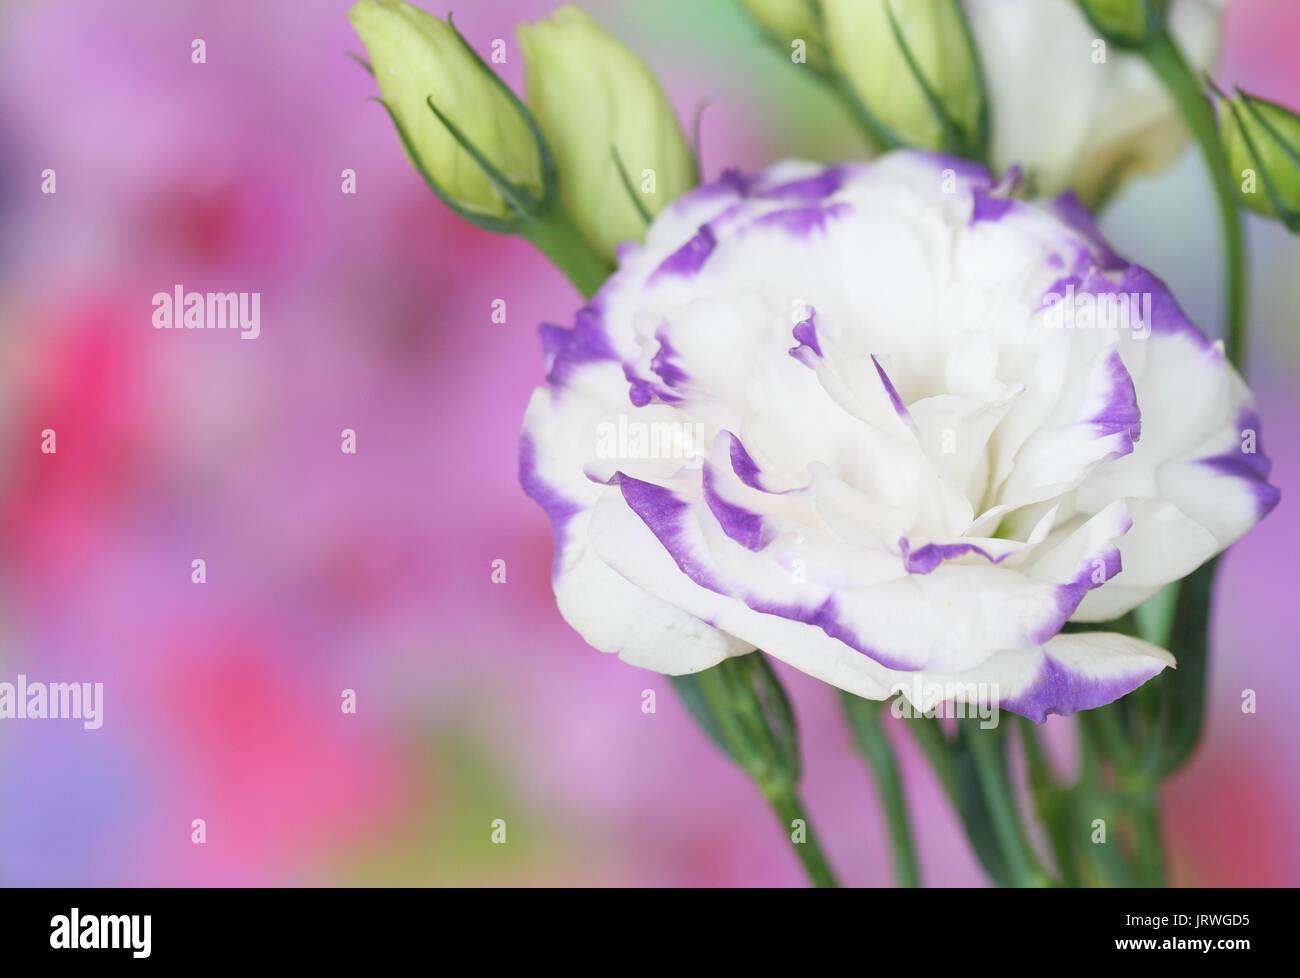 Close-up of  lisianthus flower - Stock Image